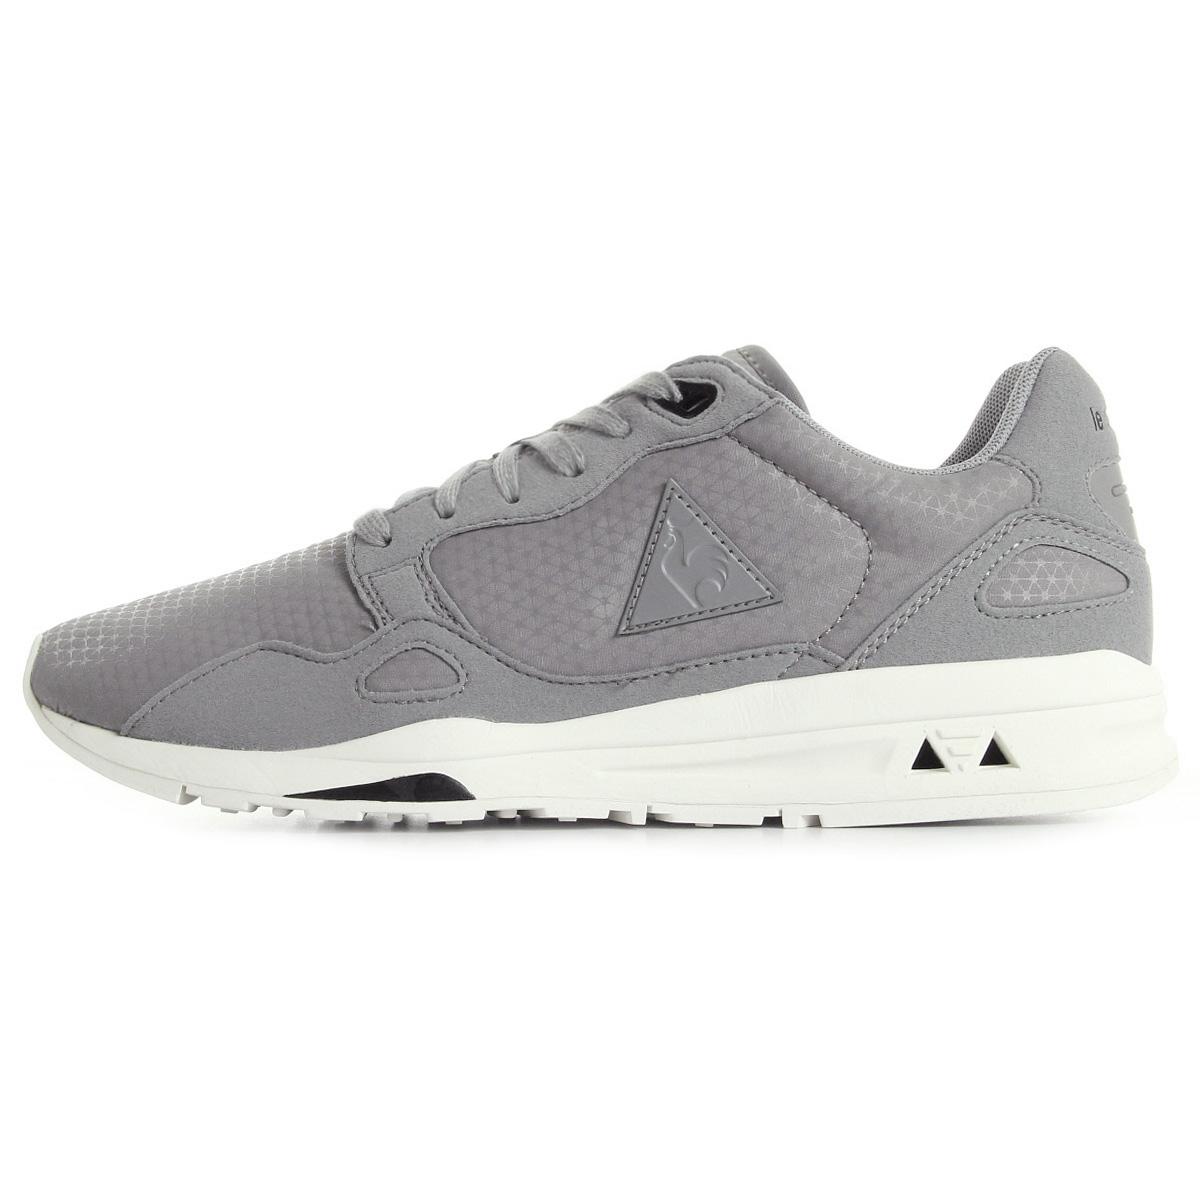 LCS Le Coq Sportif Herren Sneaker Schuhe Silicone Freizeitschuhe NEU R900 R950 Silicone Schuhe 20527a